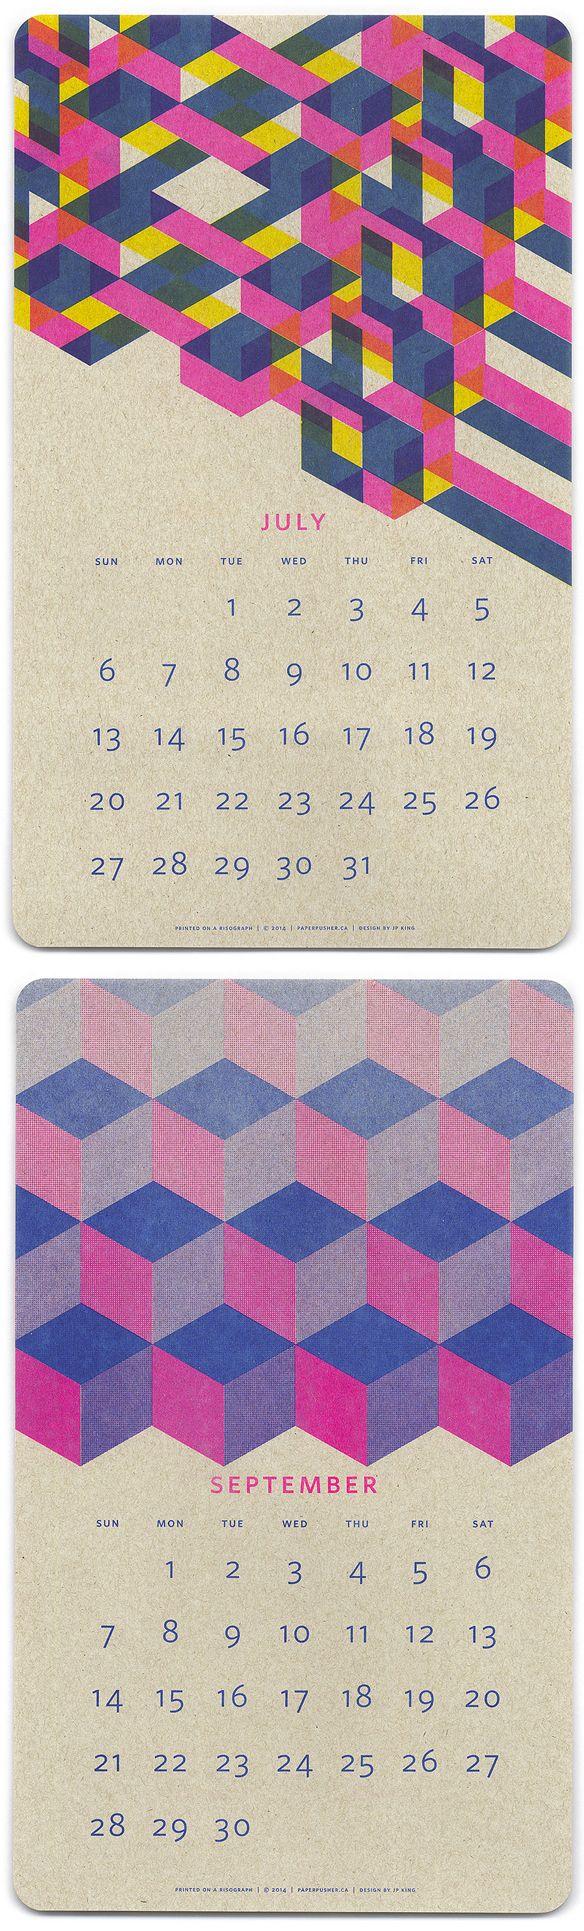 jp king - risograph print calendar, via The Jealous Curator (www.thejealouscurator.com/blog)